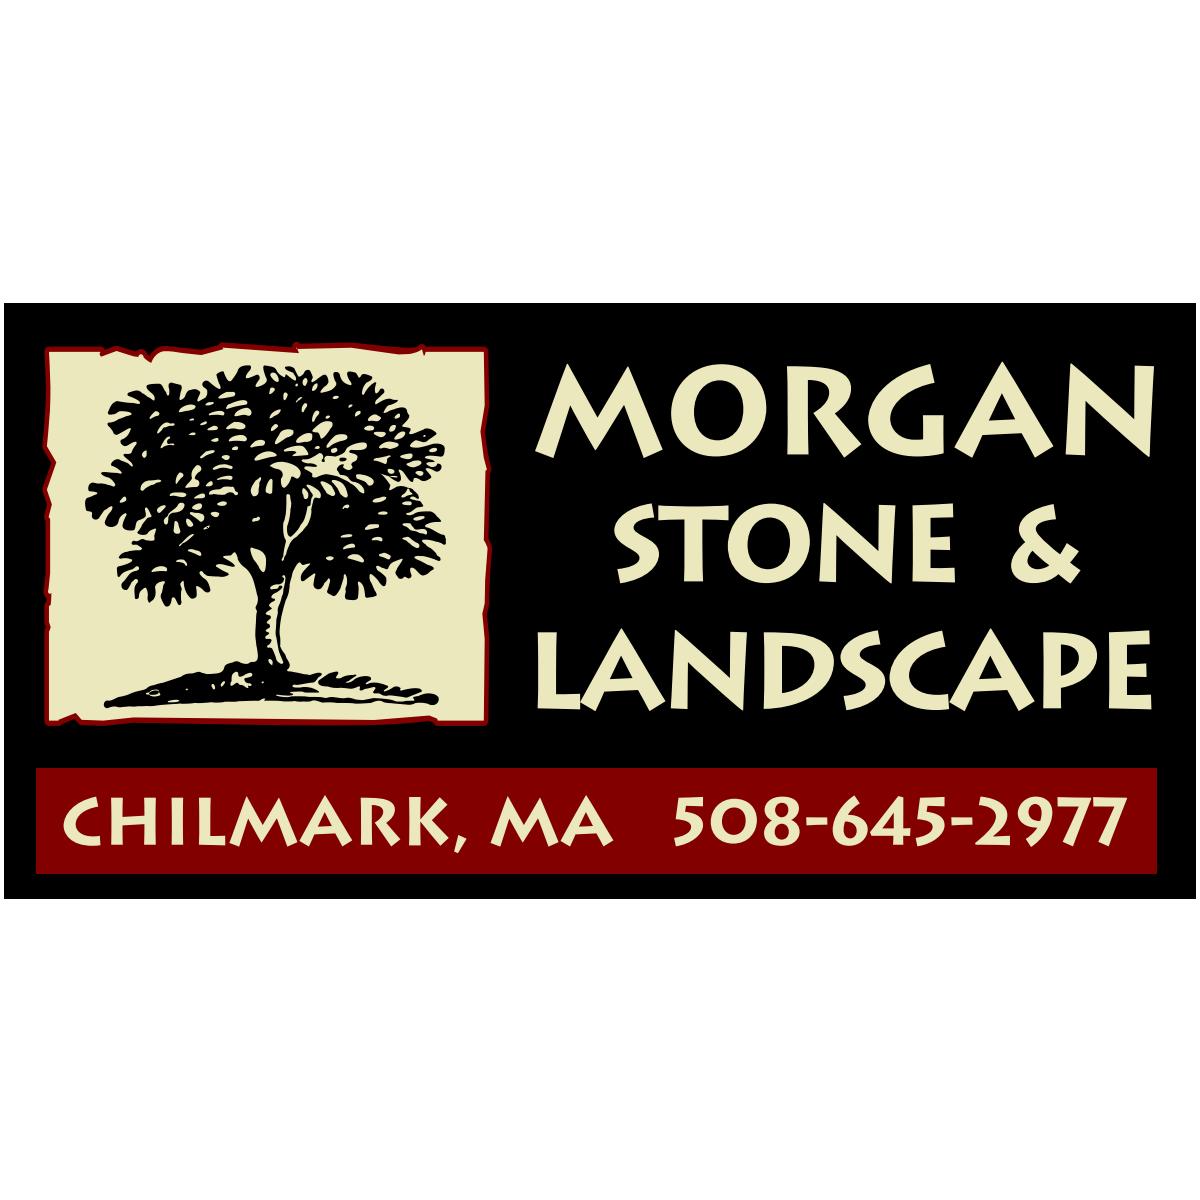 Morgan Stone & Landscape Inc. image 7